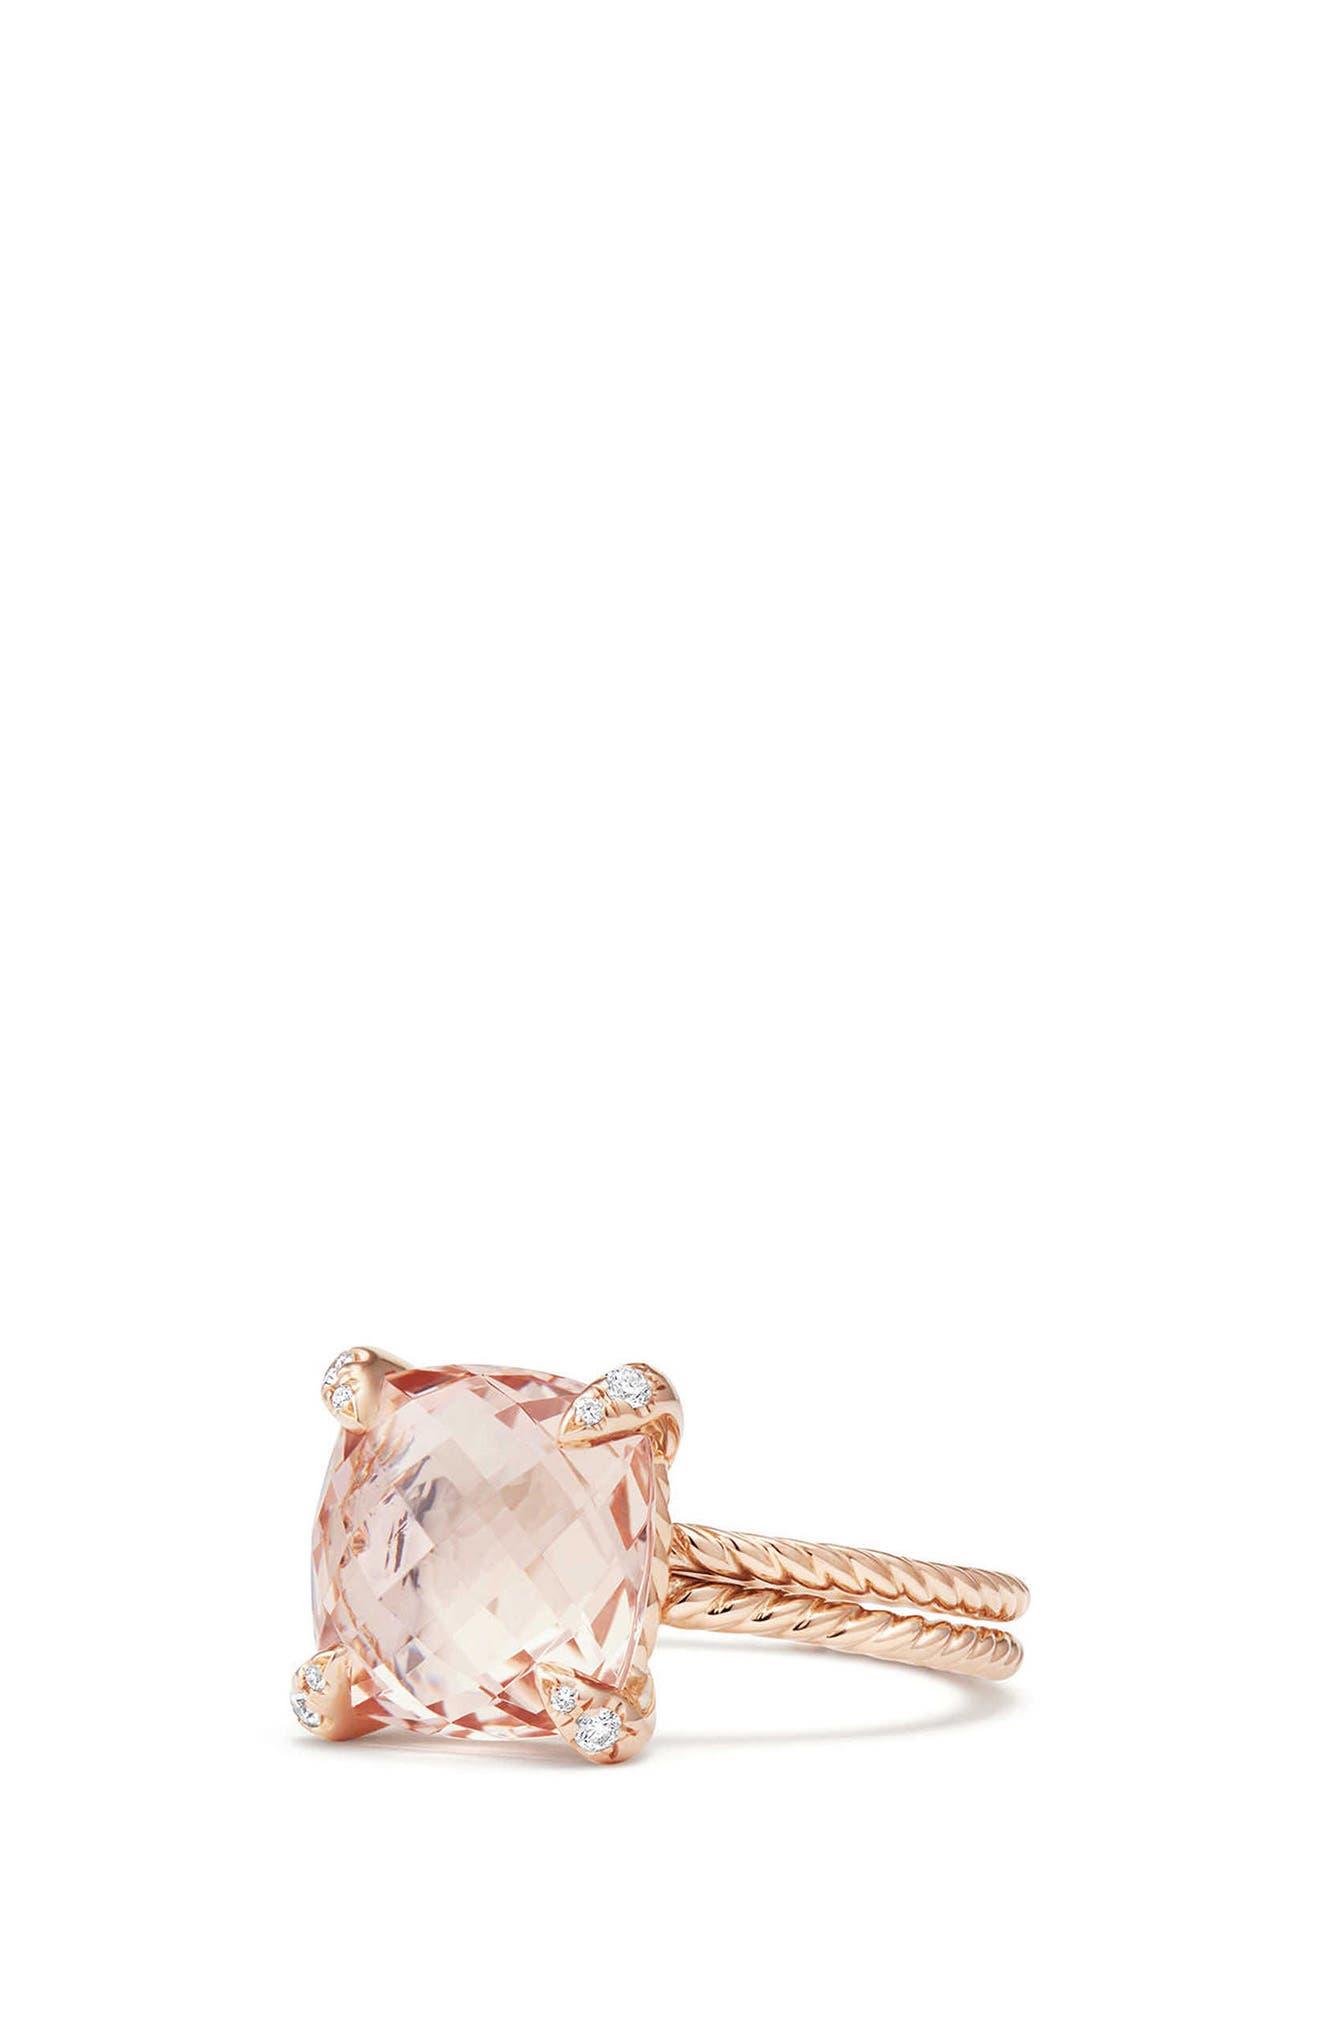 Chatelaine<sup>®</sup> Morganite & Diamond Ring in 18K Rose Gold,                             Alternate thumbnail 3, color,                             Rose Gold/ Diamond/ Morganite